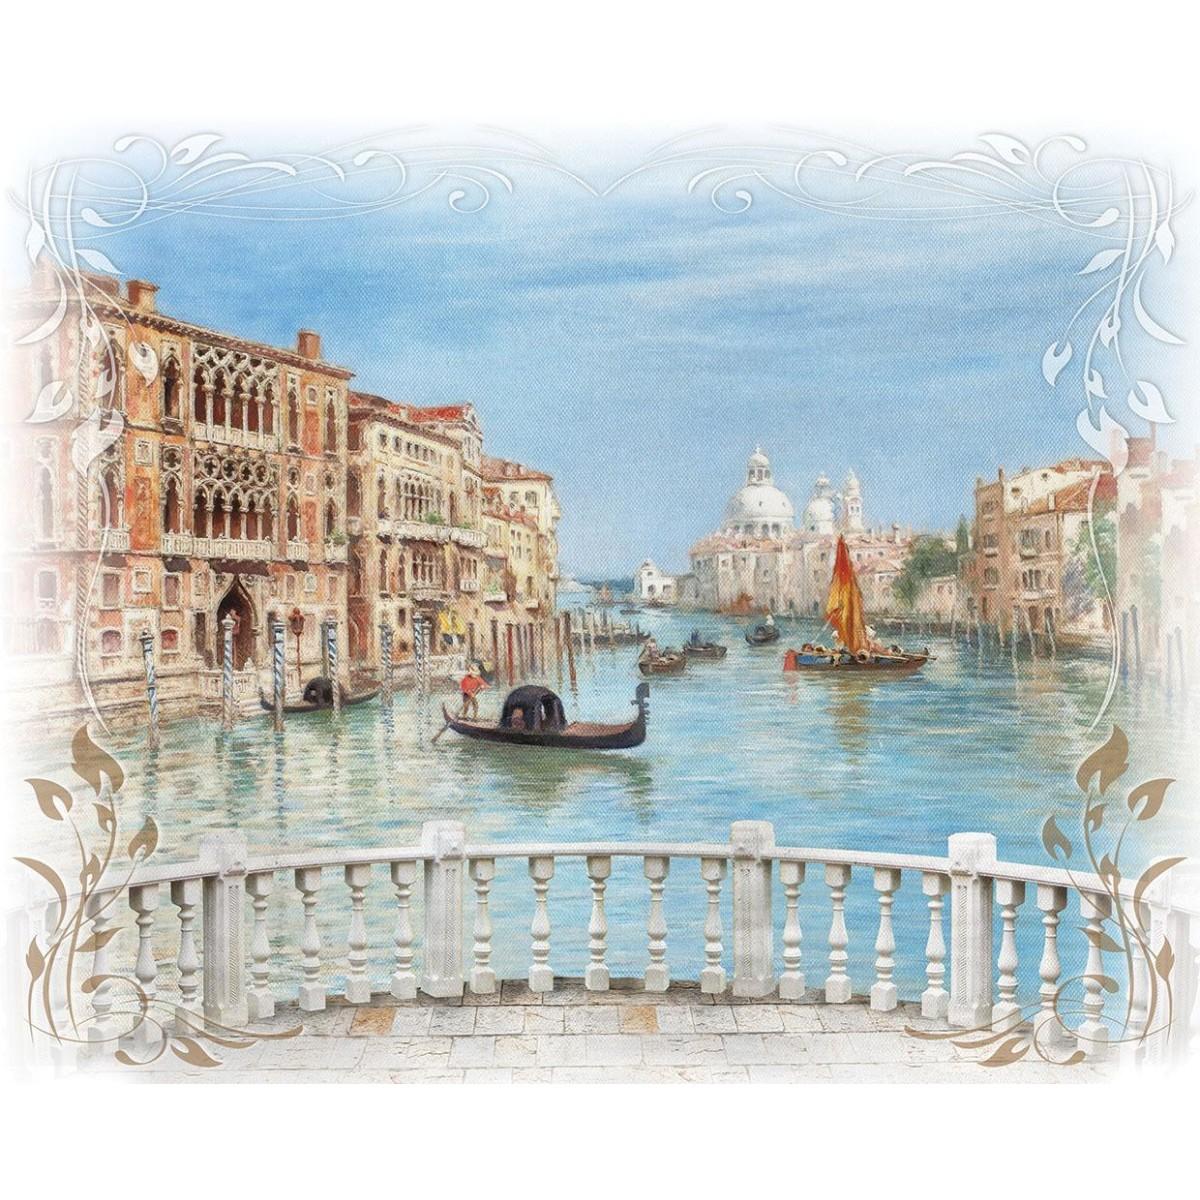 Декоративное панно Твоя планета Венецианский мост 254х318 см